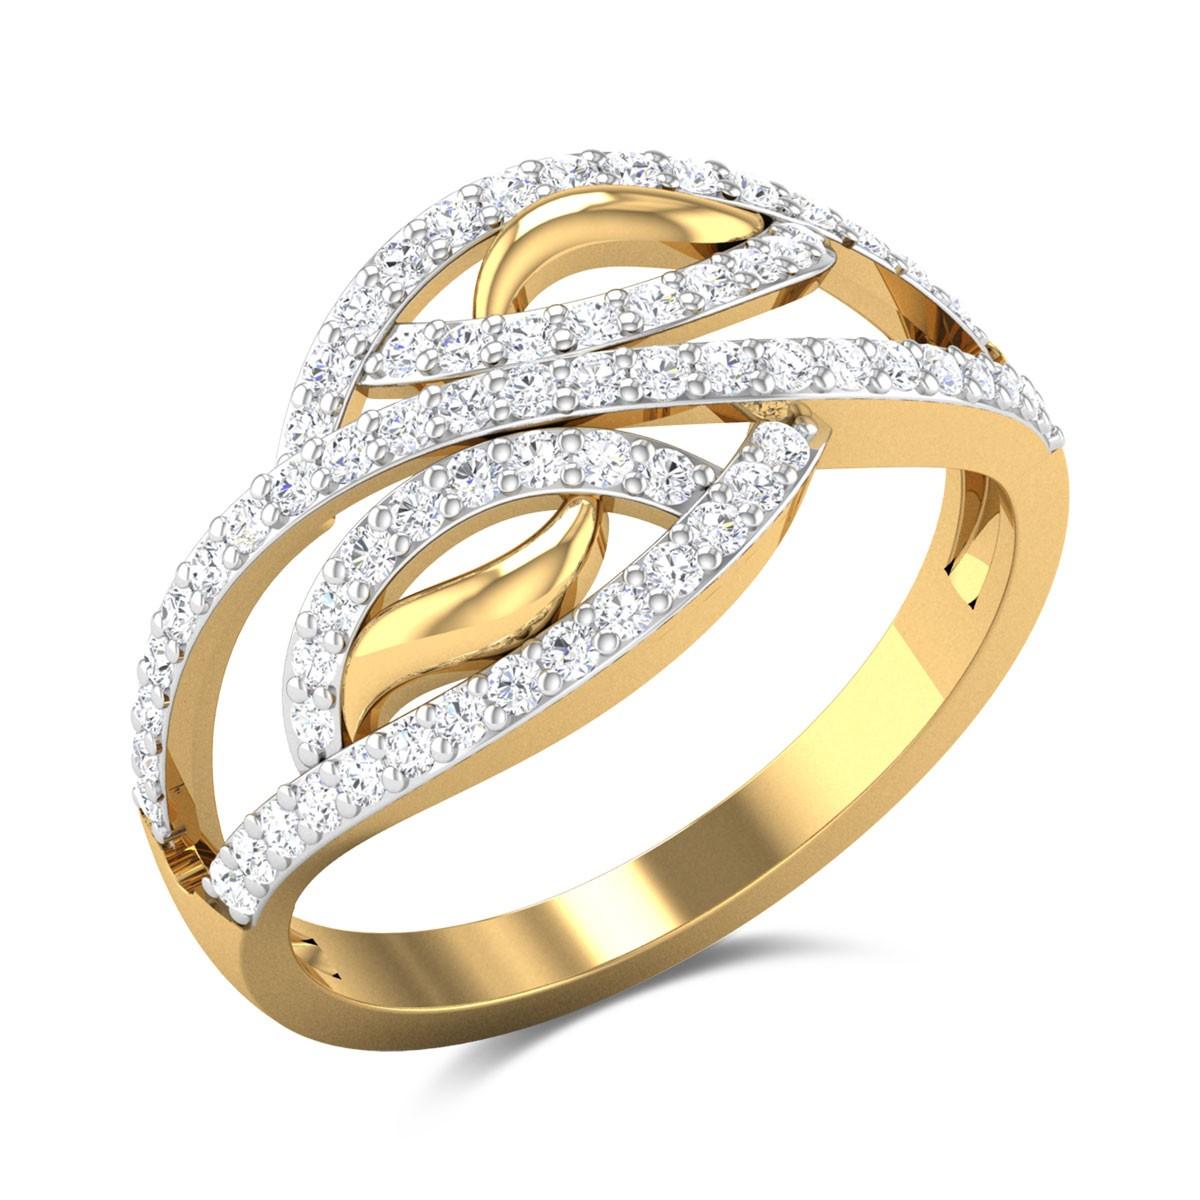 Buy Breauna Diamond Ring in 3 Gms Gold Online